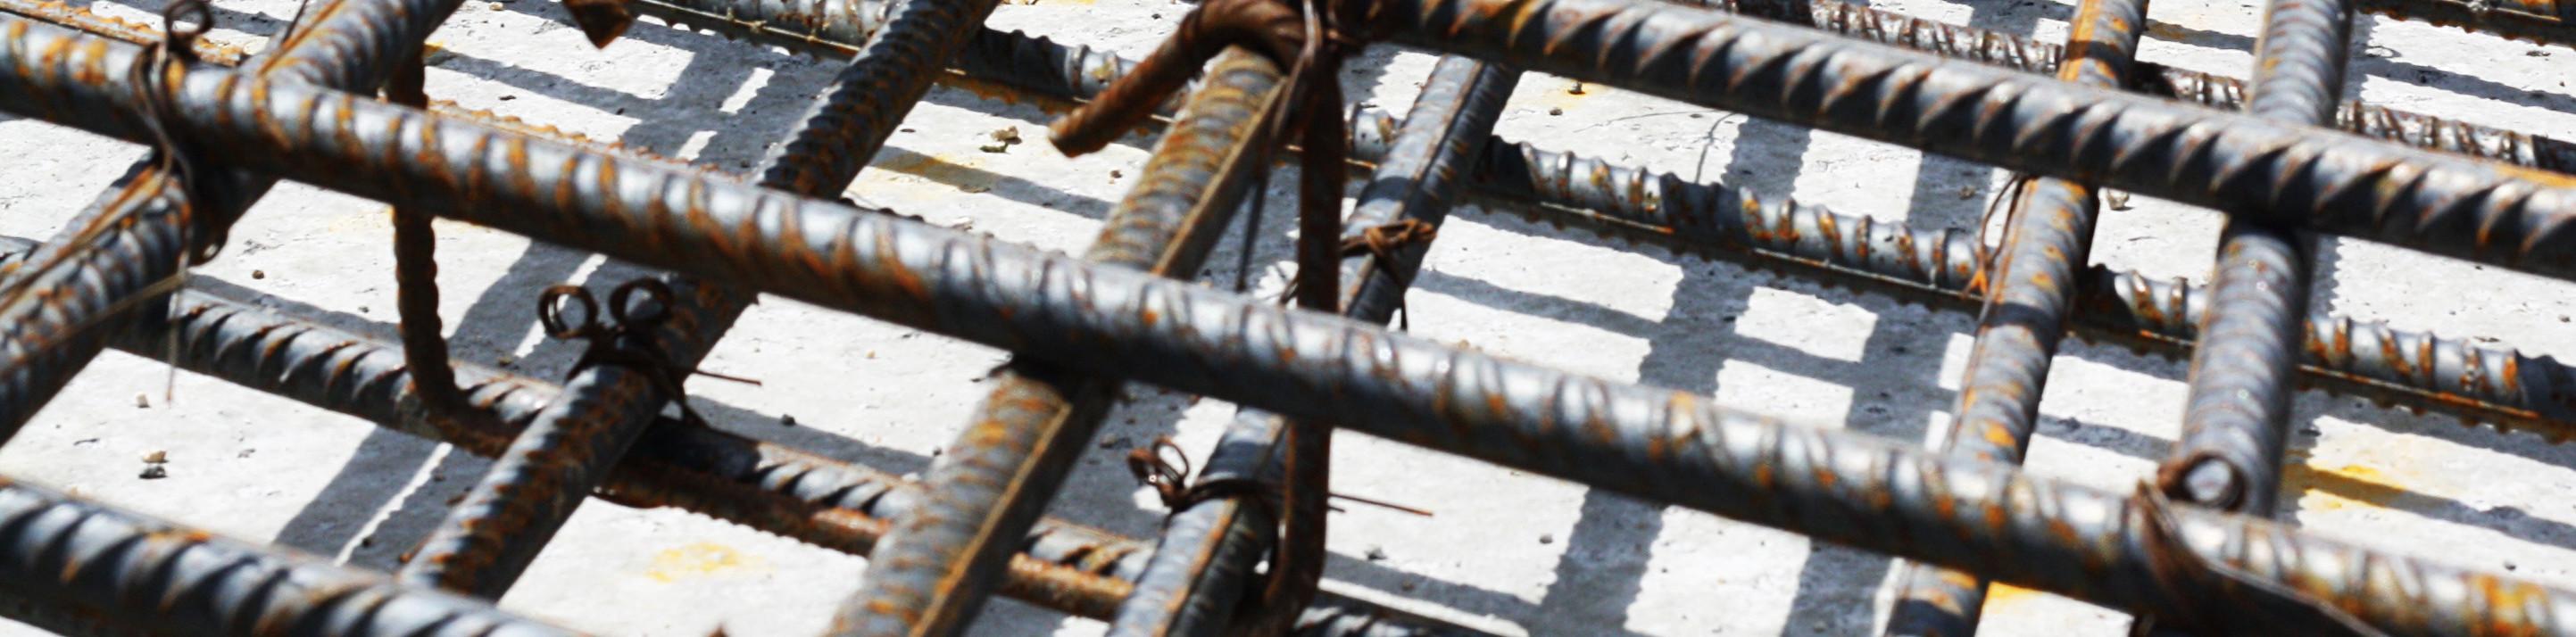 Rebar Support Chairs & Wheels Van Laan Construction Supply